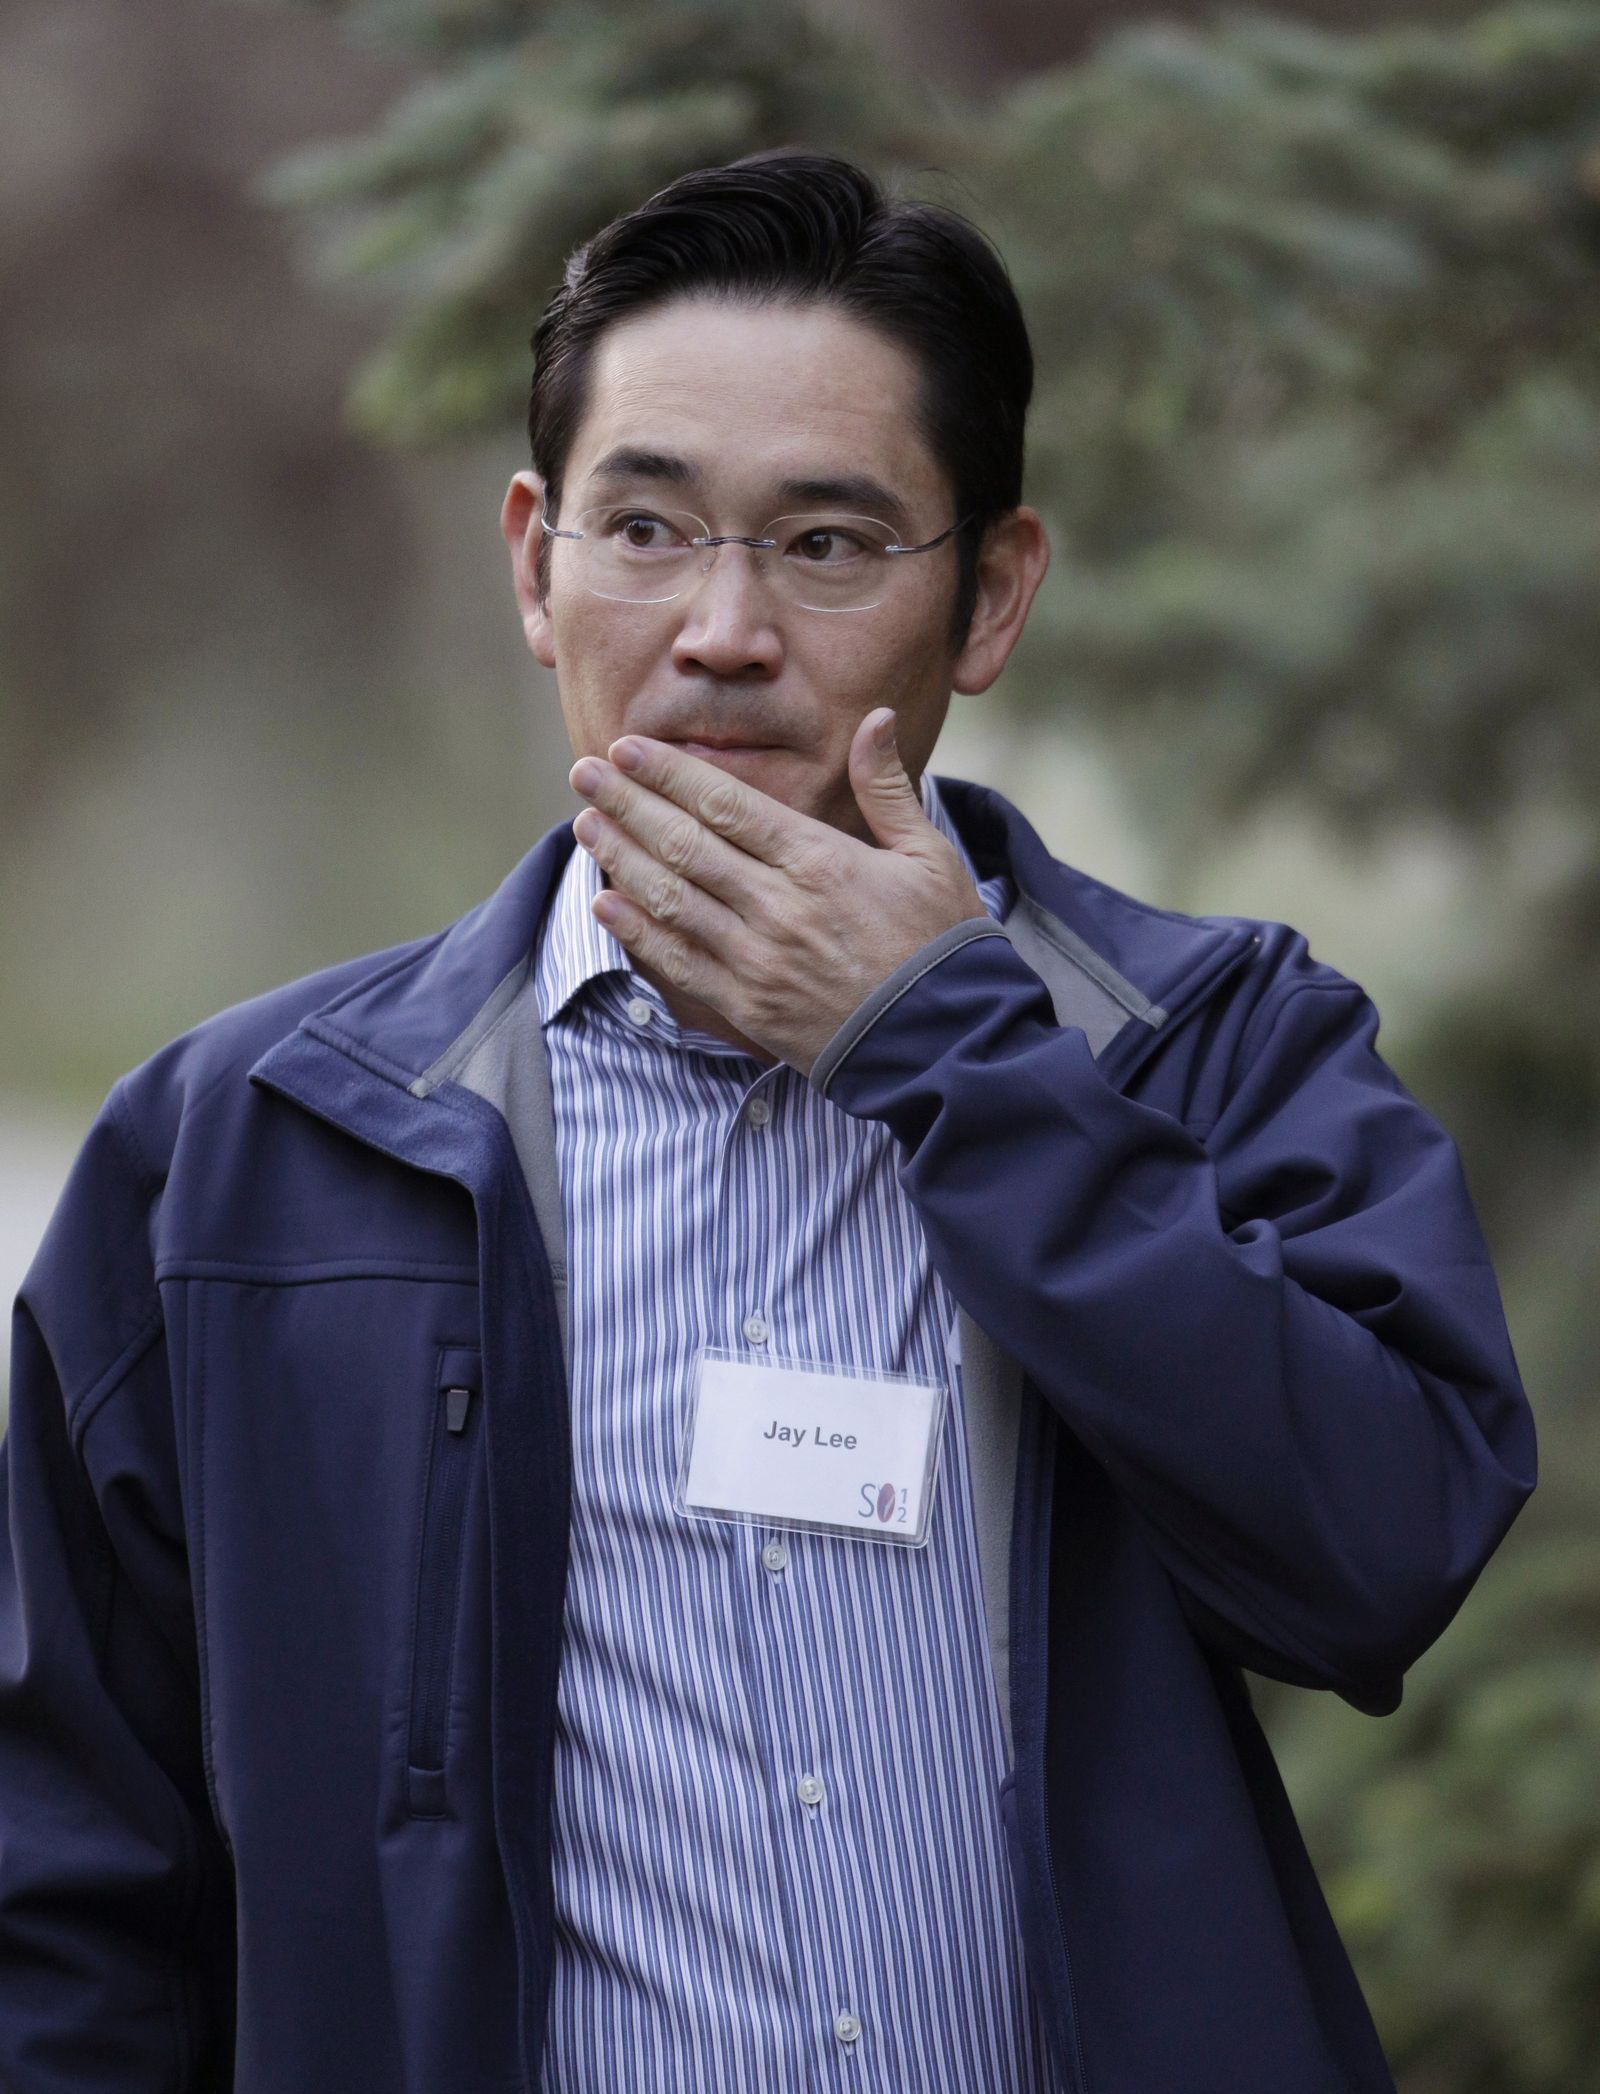 Jae jay Yong / Verlierer